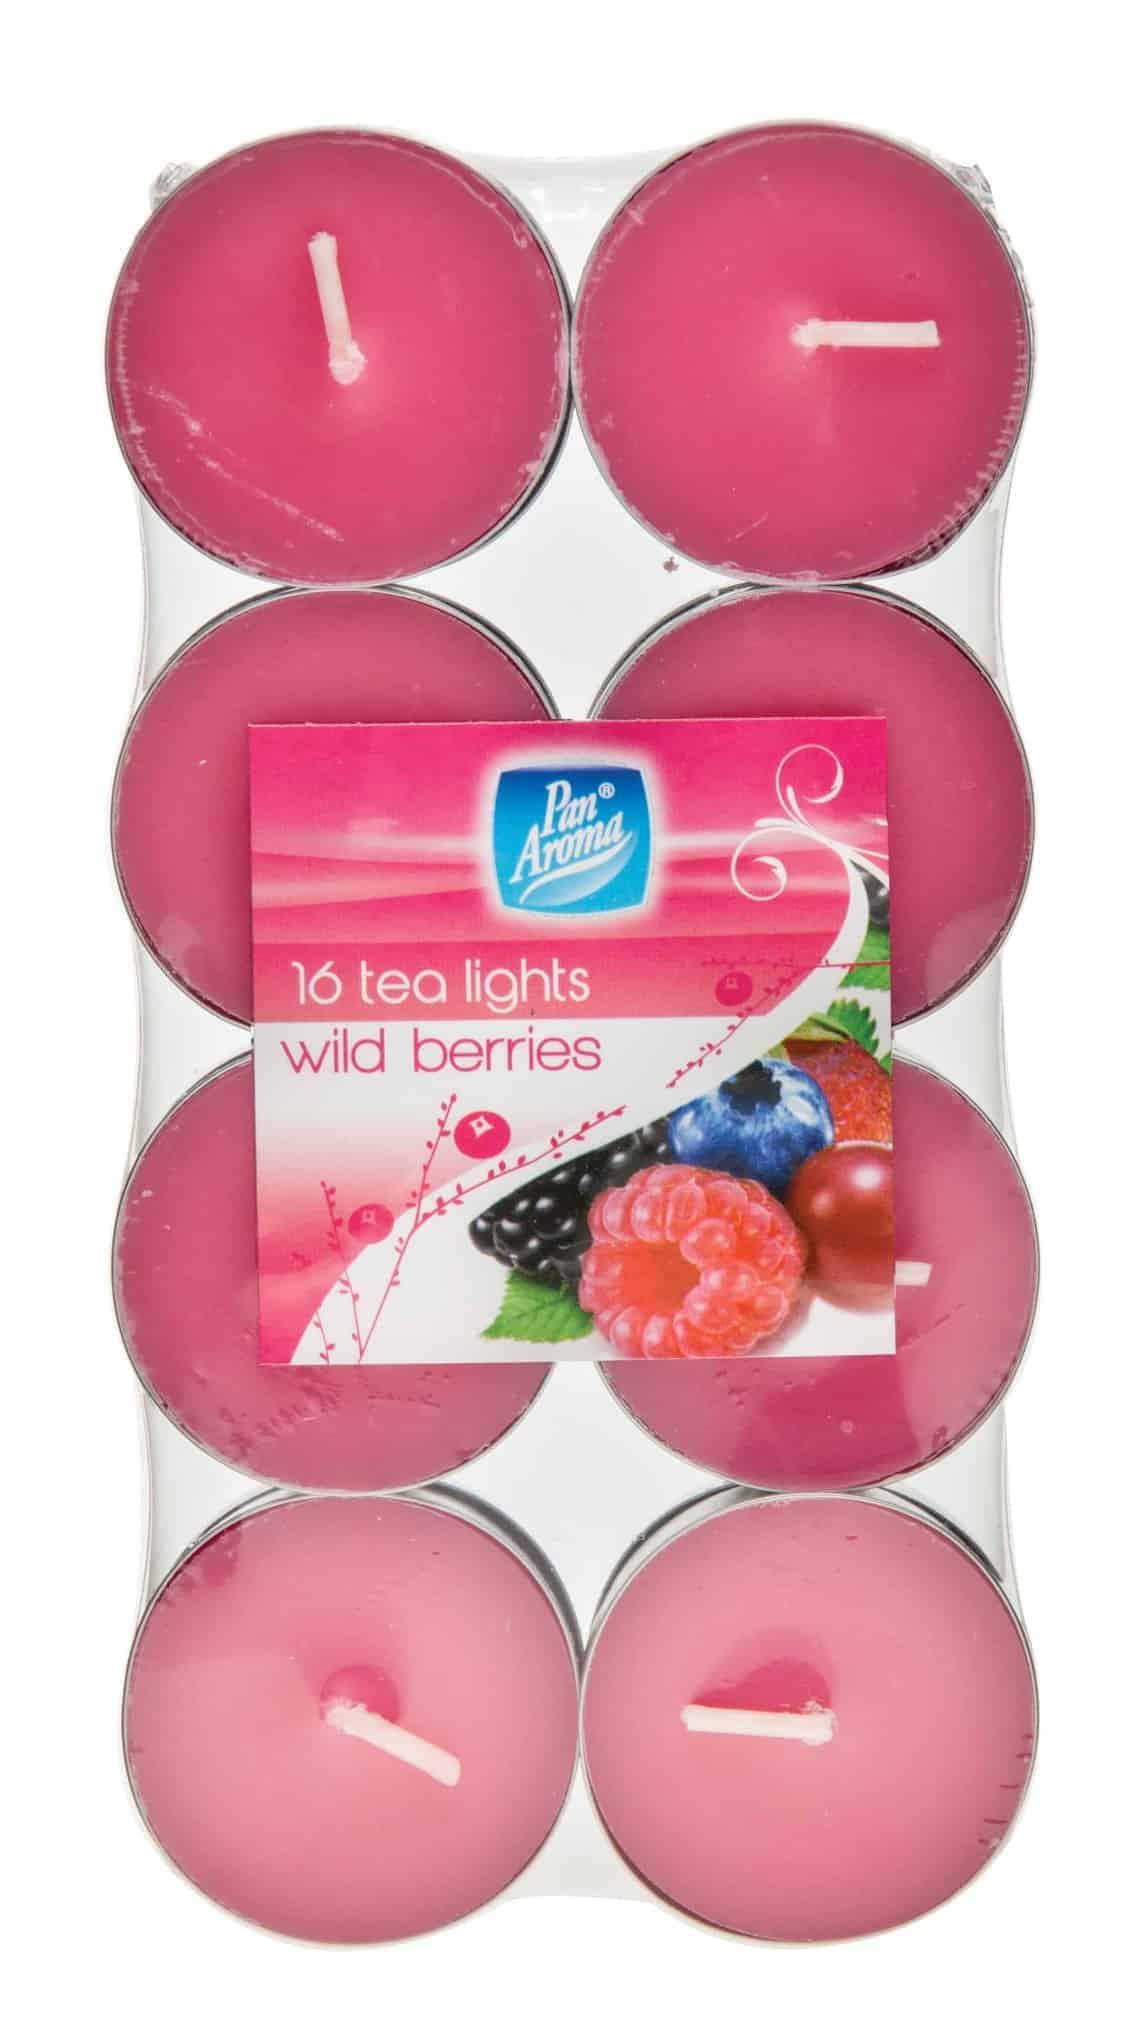 Pan Aroma Wild Berries Colour Tea-Lights 16 Pack